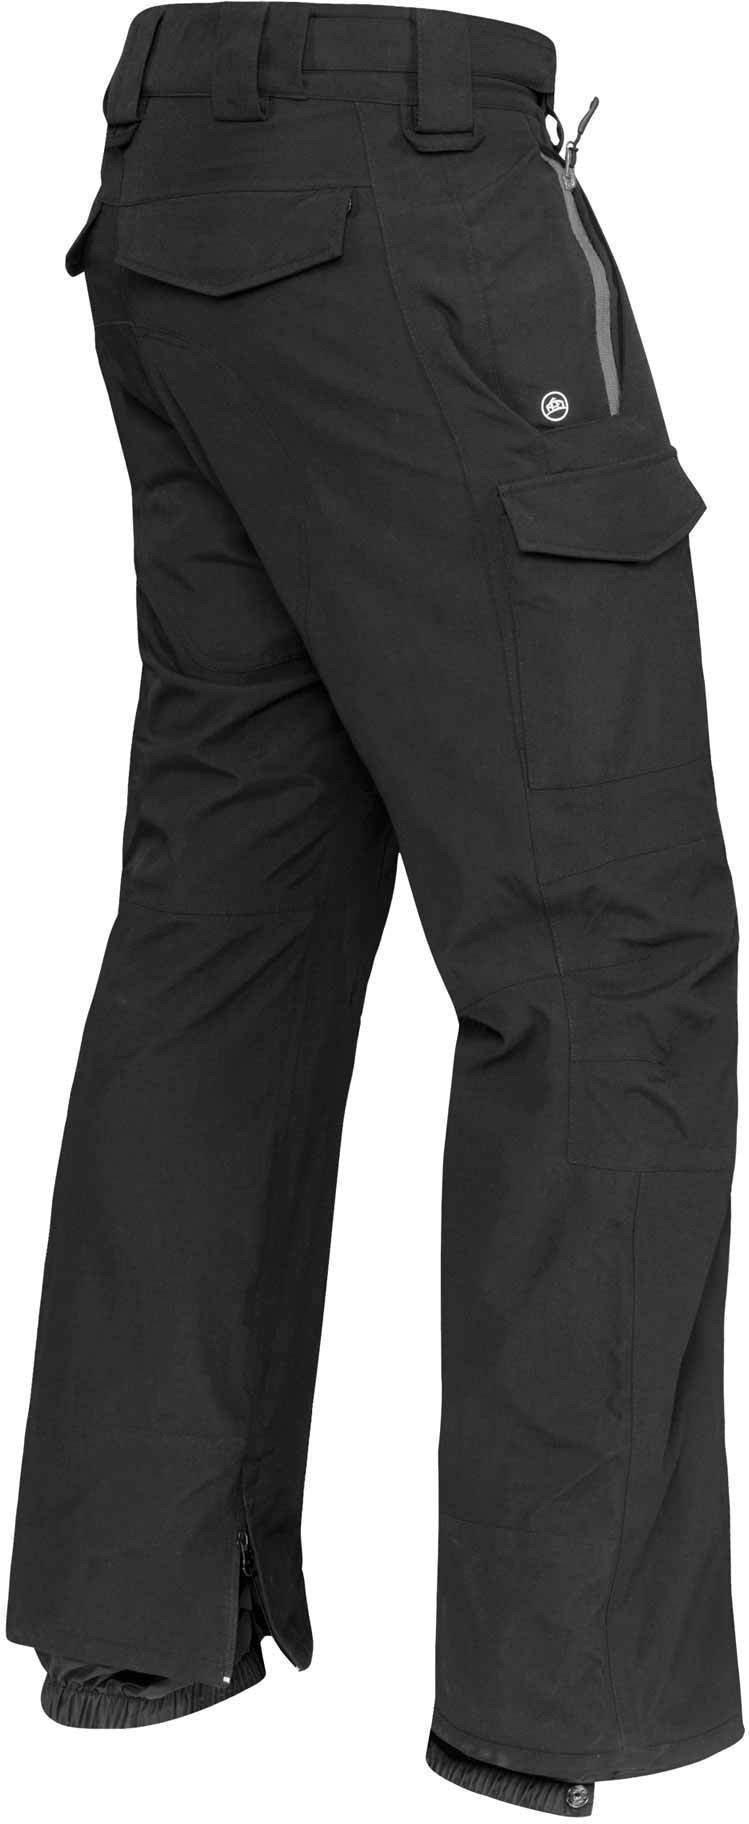 WTSTEP-2W - Black - WorkwearToronto.com - Women's Hard Shell Pant Custom Decoration